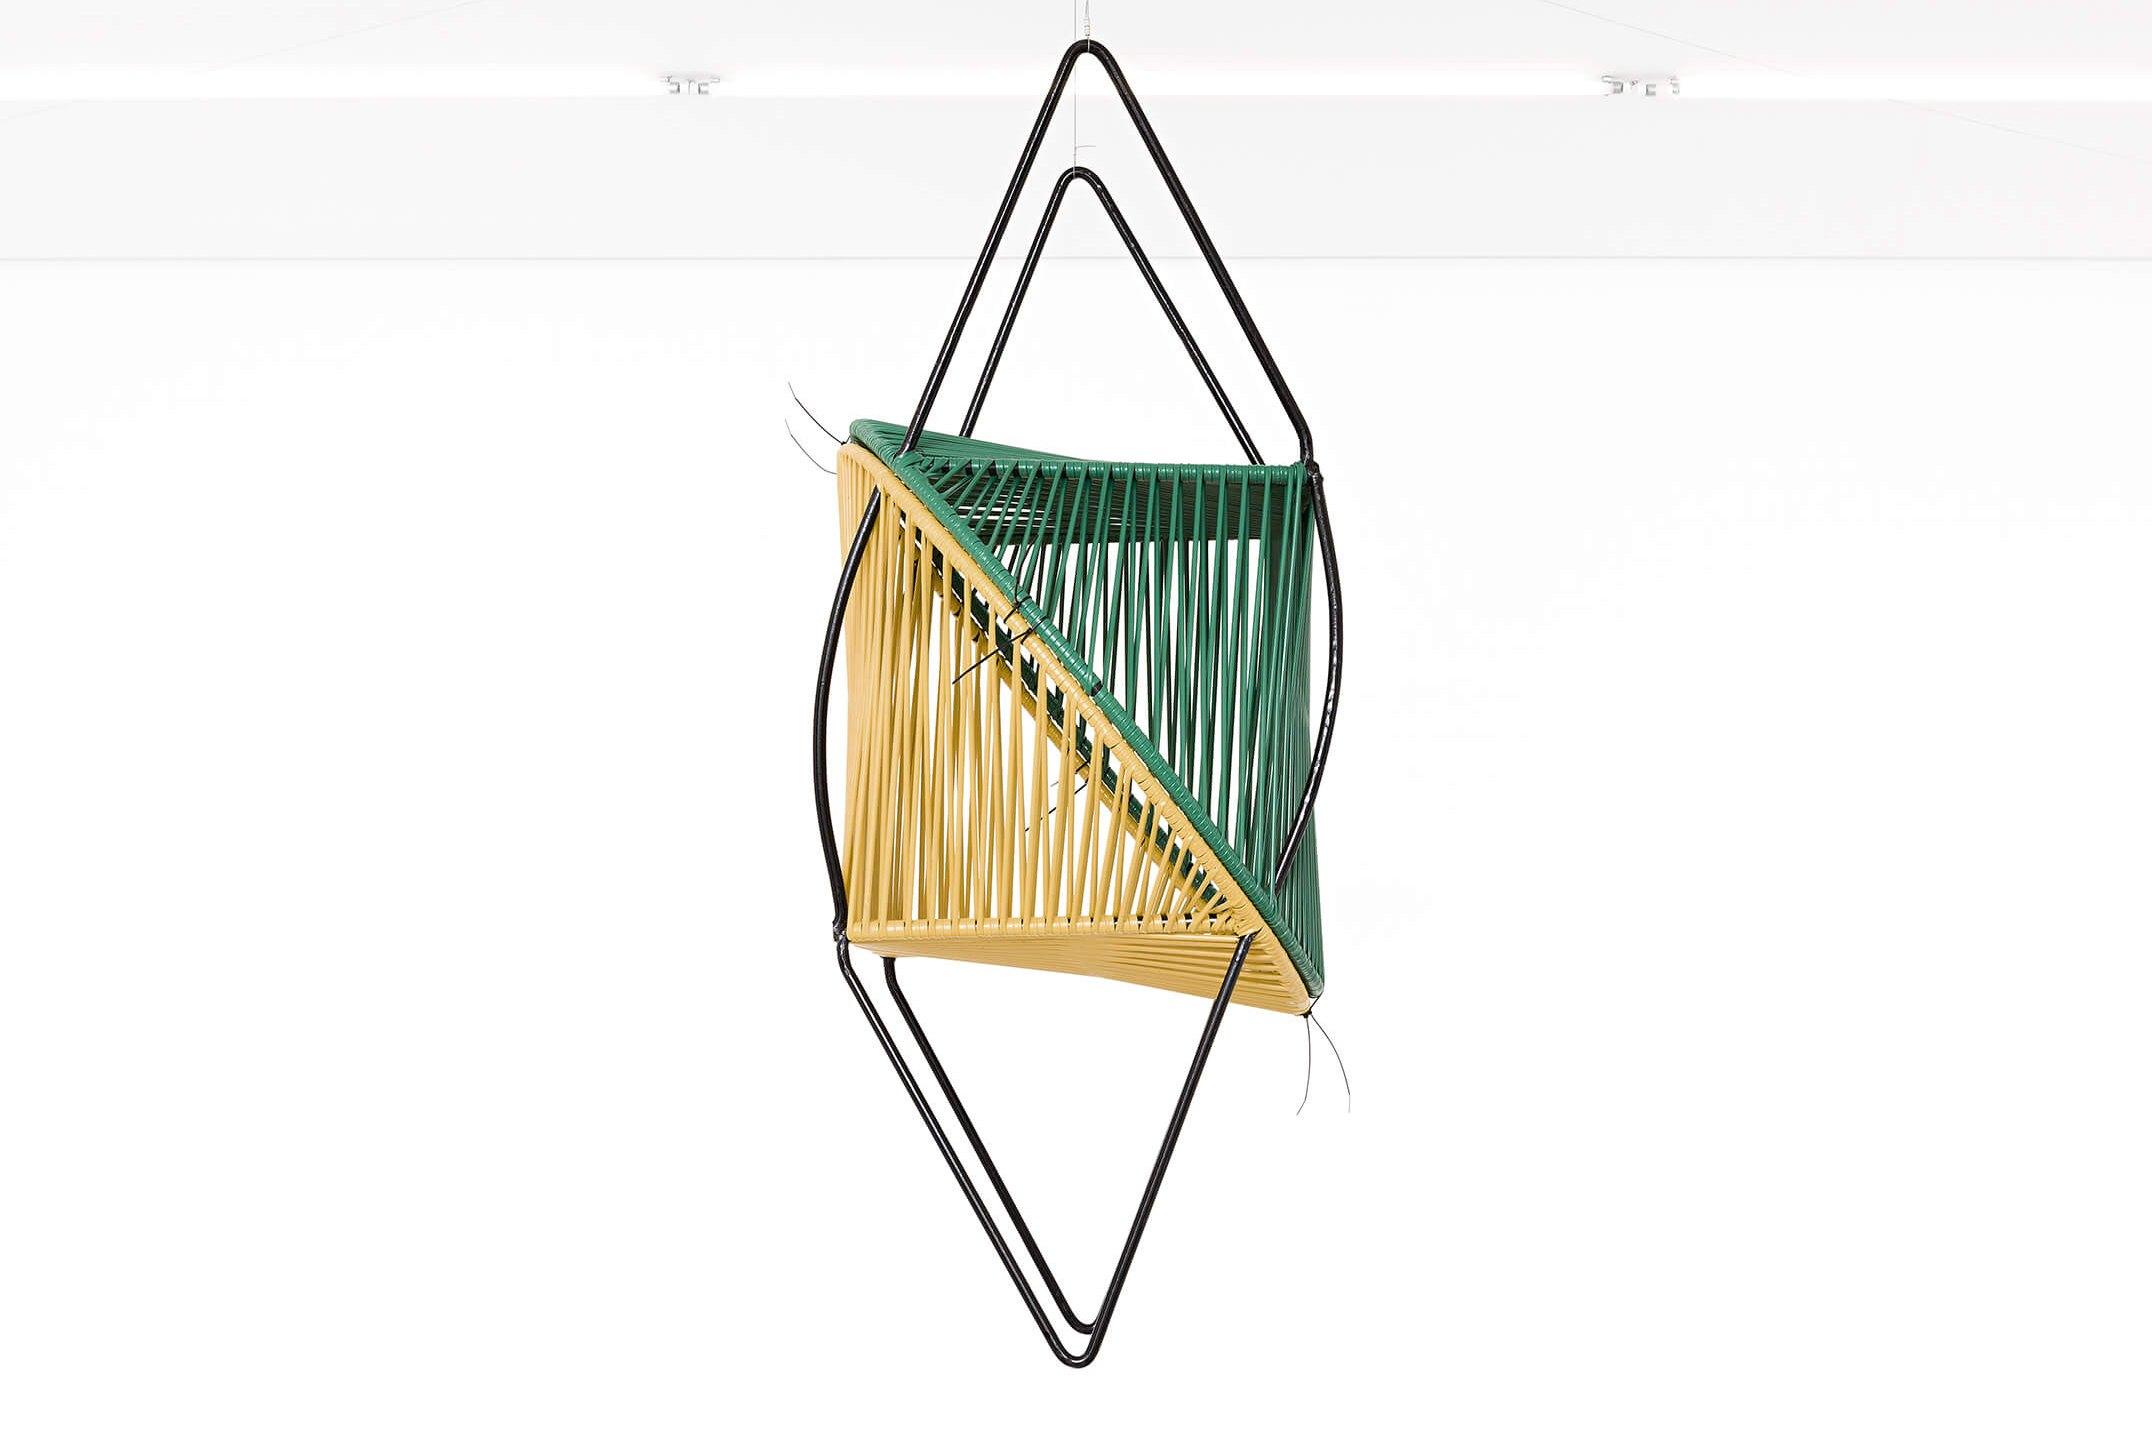 Adriano Costa,<em>São João Balloon</em>, 2015,two chairs,118 × 75 × 46 cm - Mendes Wood DM